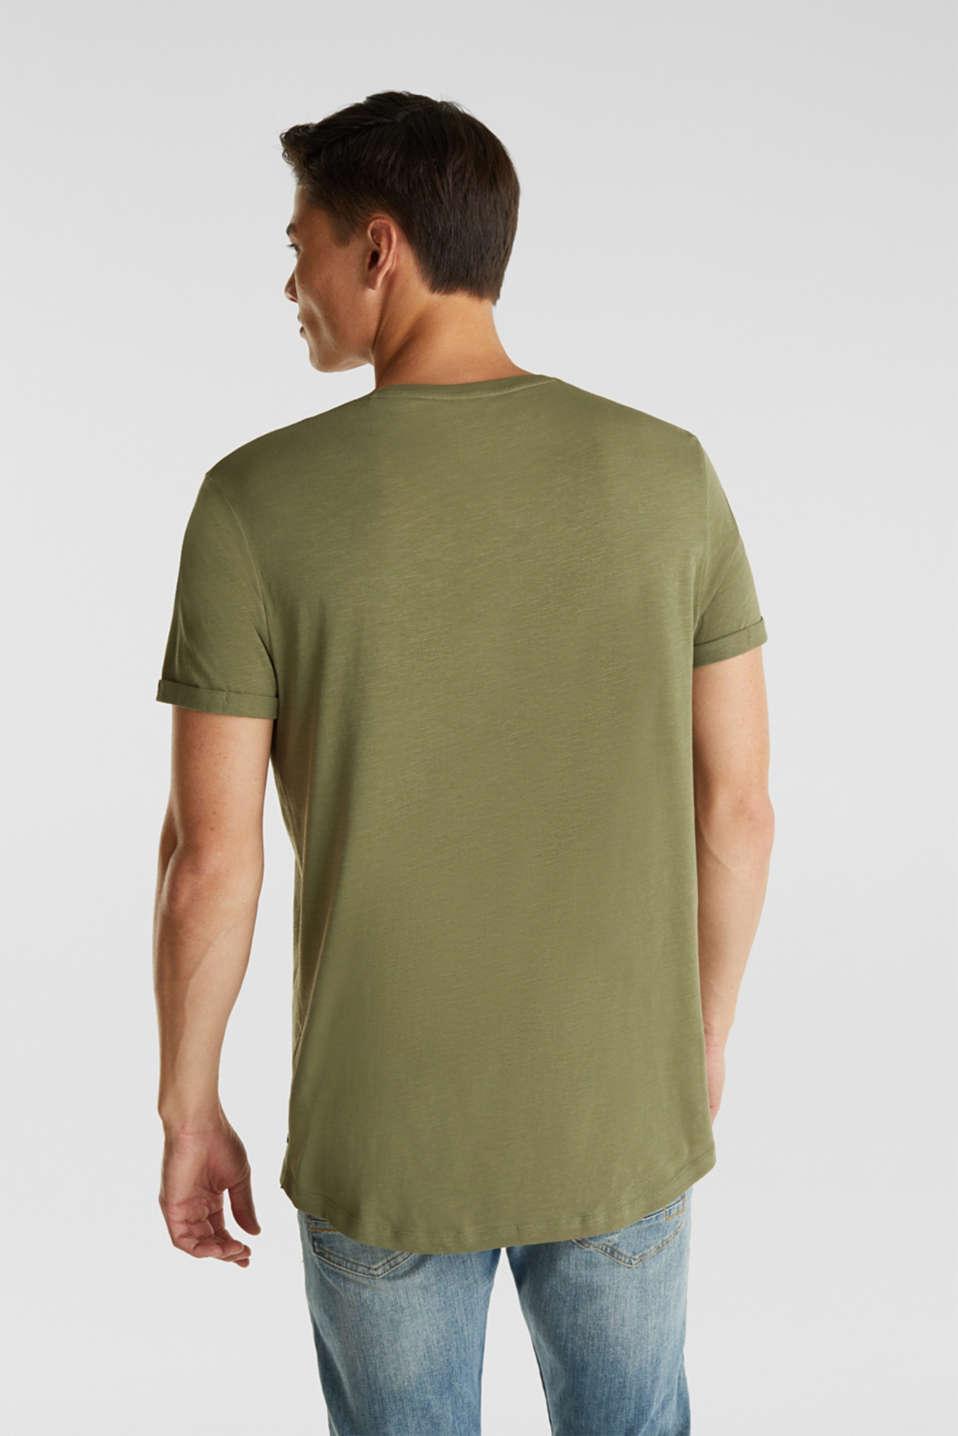 Jersey cotton top, KHAKI GREEN, detail image number 2